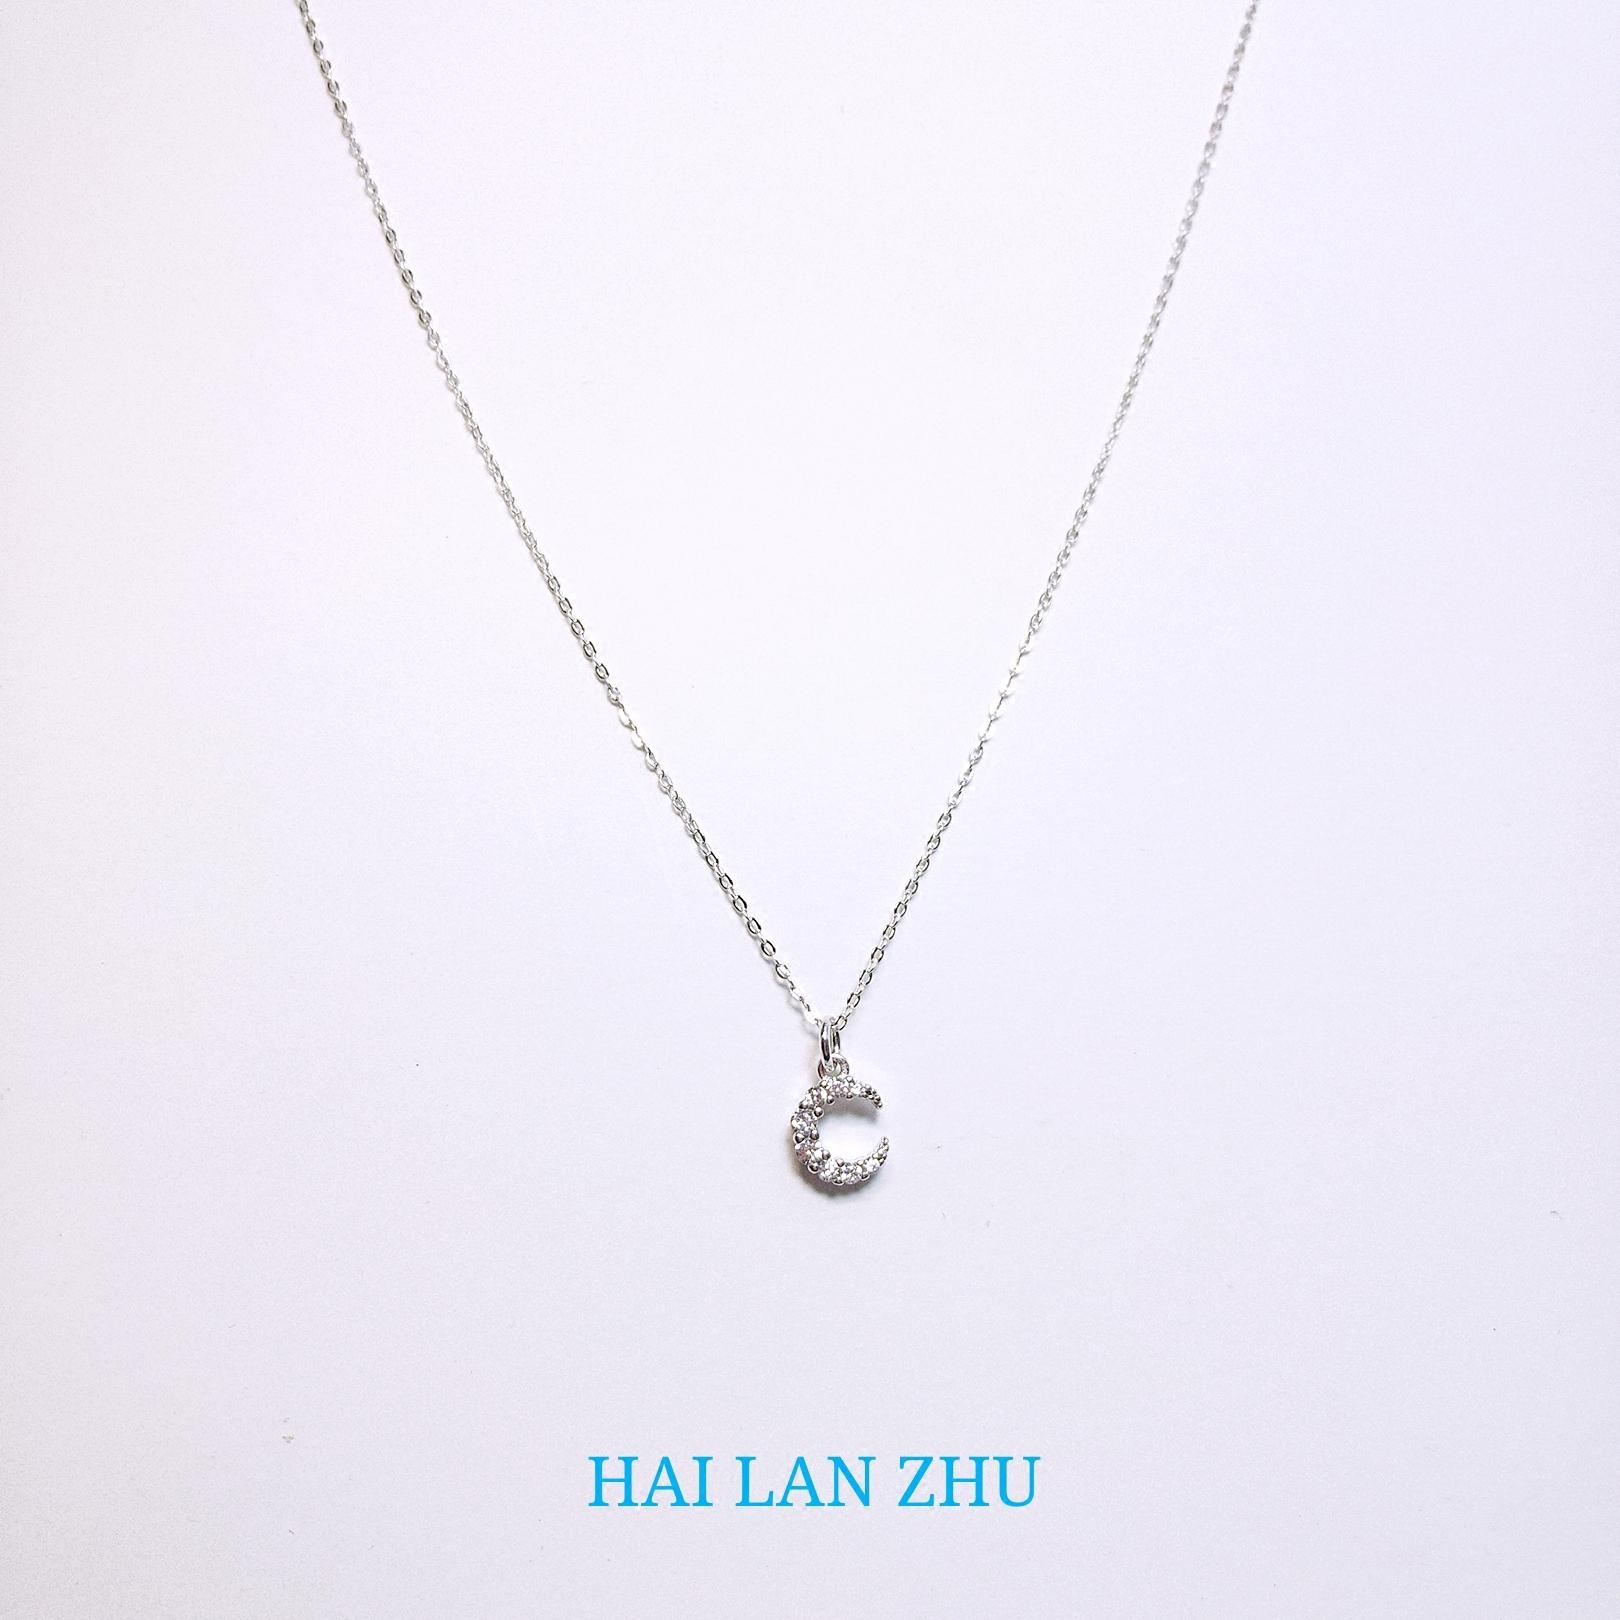 [Artemis] original design of sea blue bead S925 pure silver Moon Necklace